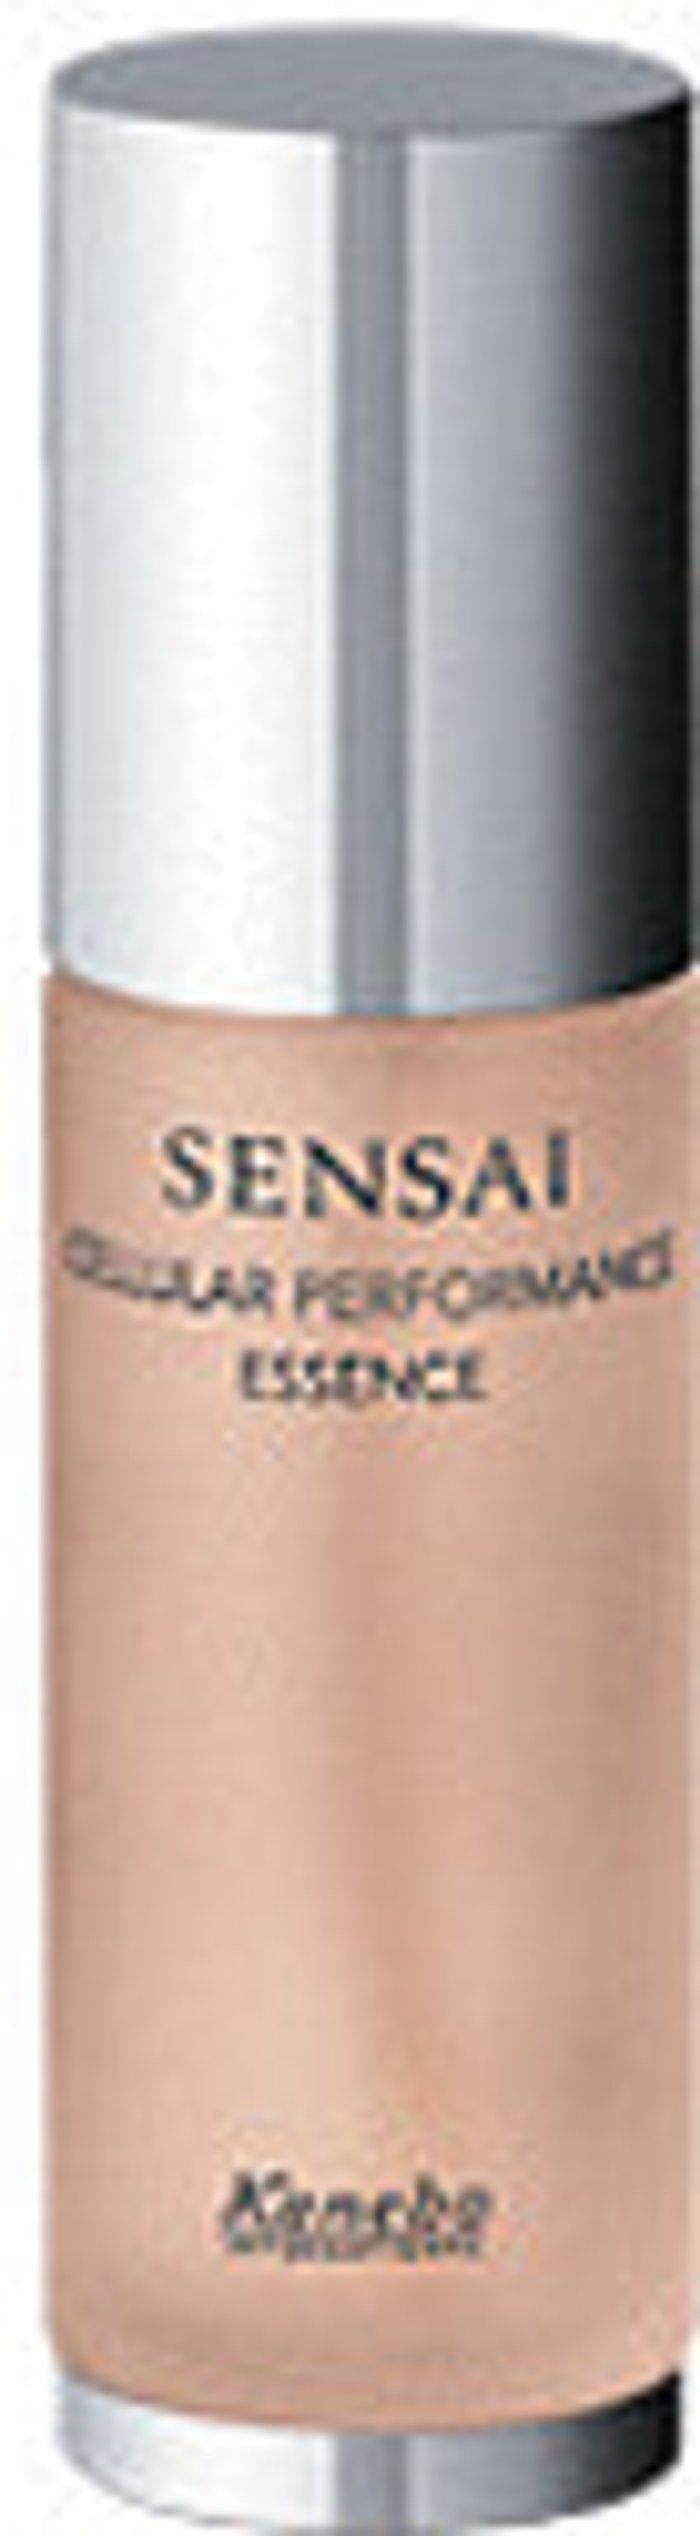 Kanebo Kanebo Sensai Cellular Essence (40ml)